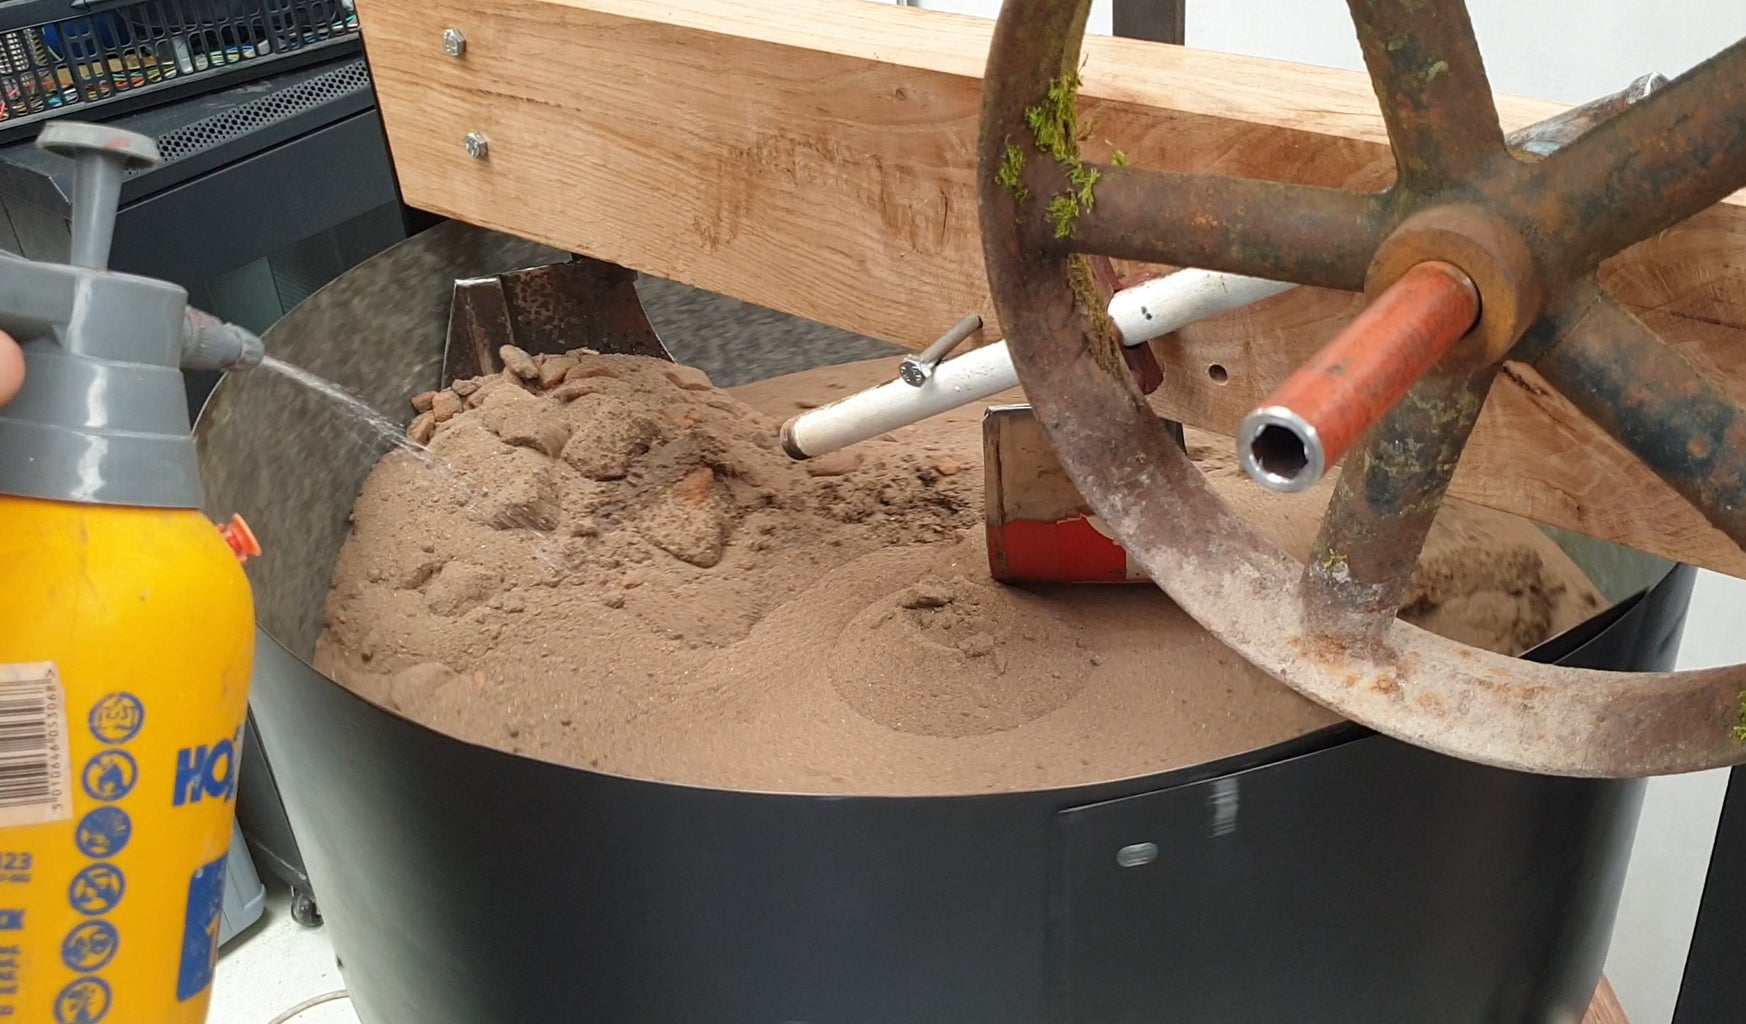 Green Sand Muller - Use